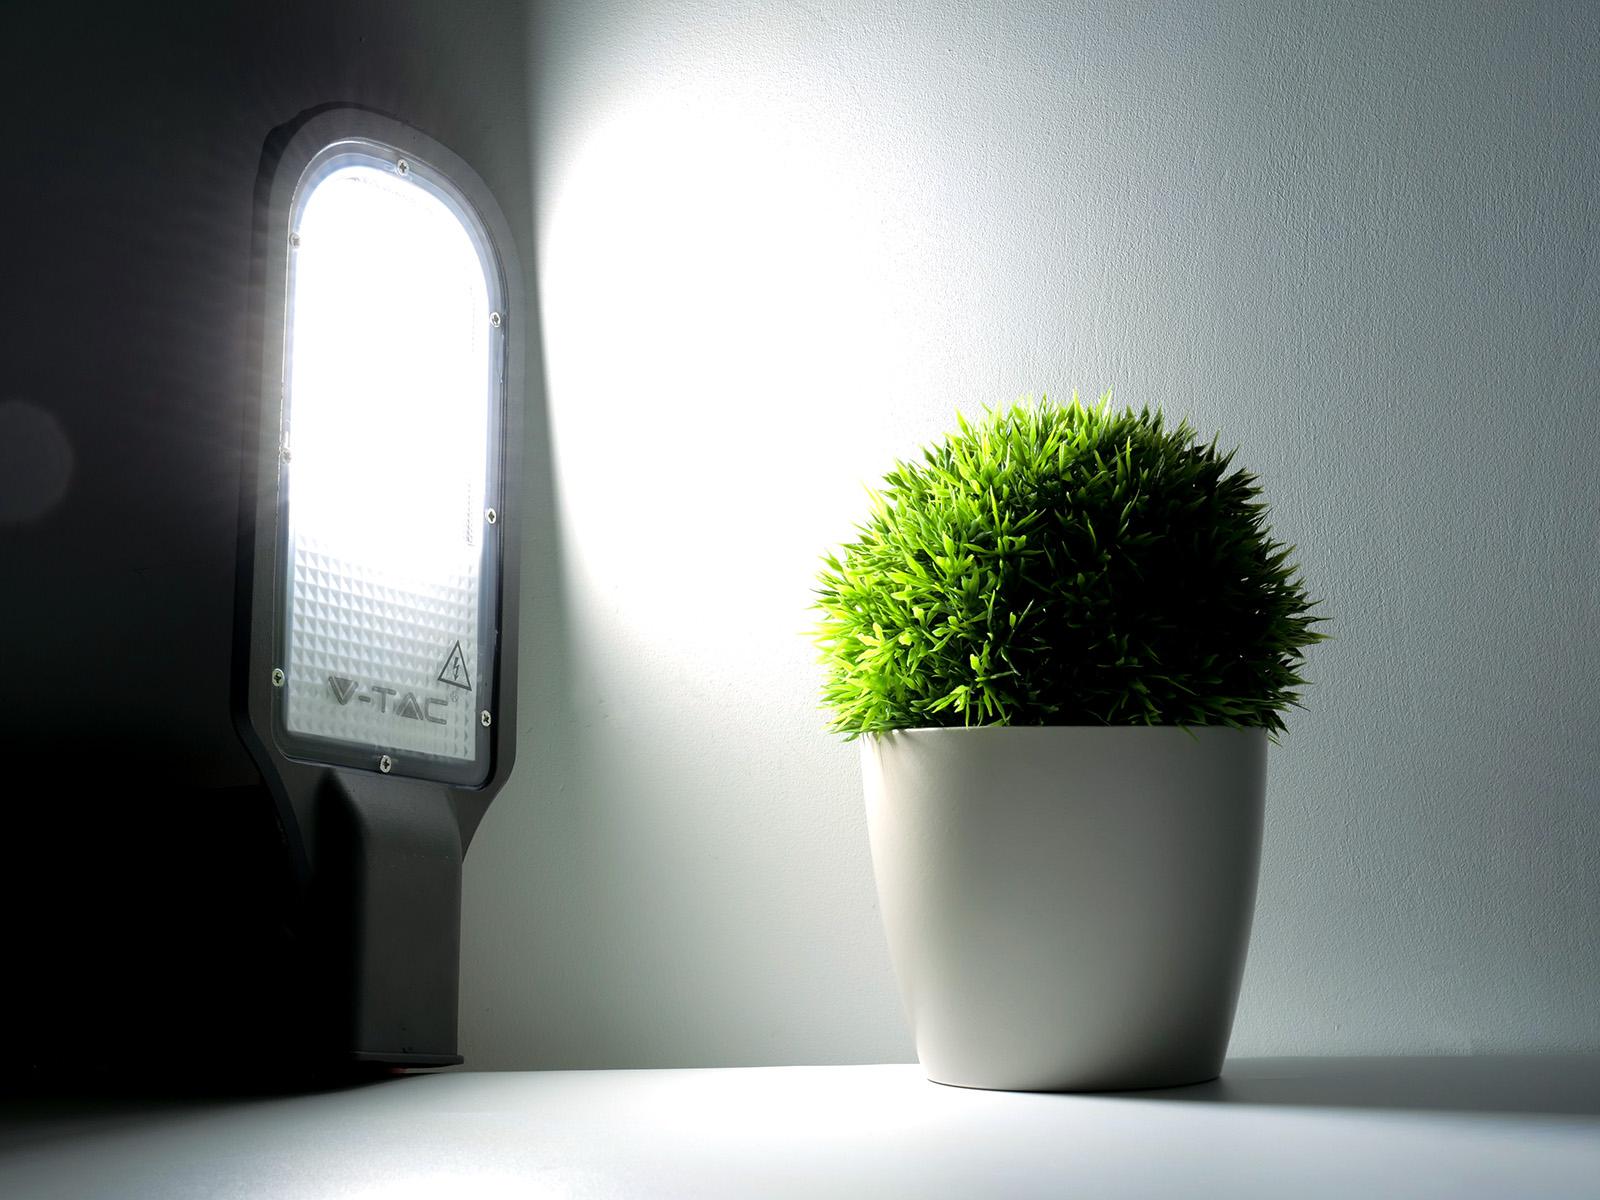 https://www.anrodiszlec.hu/images/img_maxi/vtac-utcai-led-lampa-st-30watt-hideg-feher-samsung-sku538-8.jpg